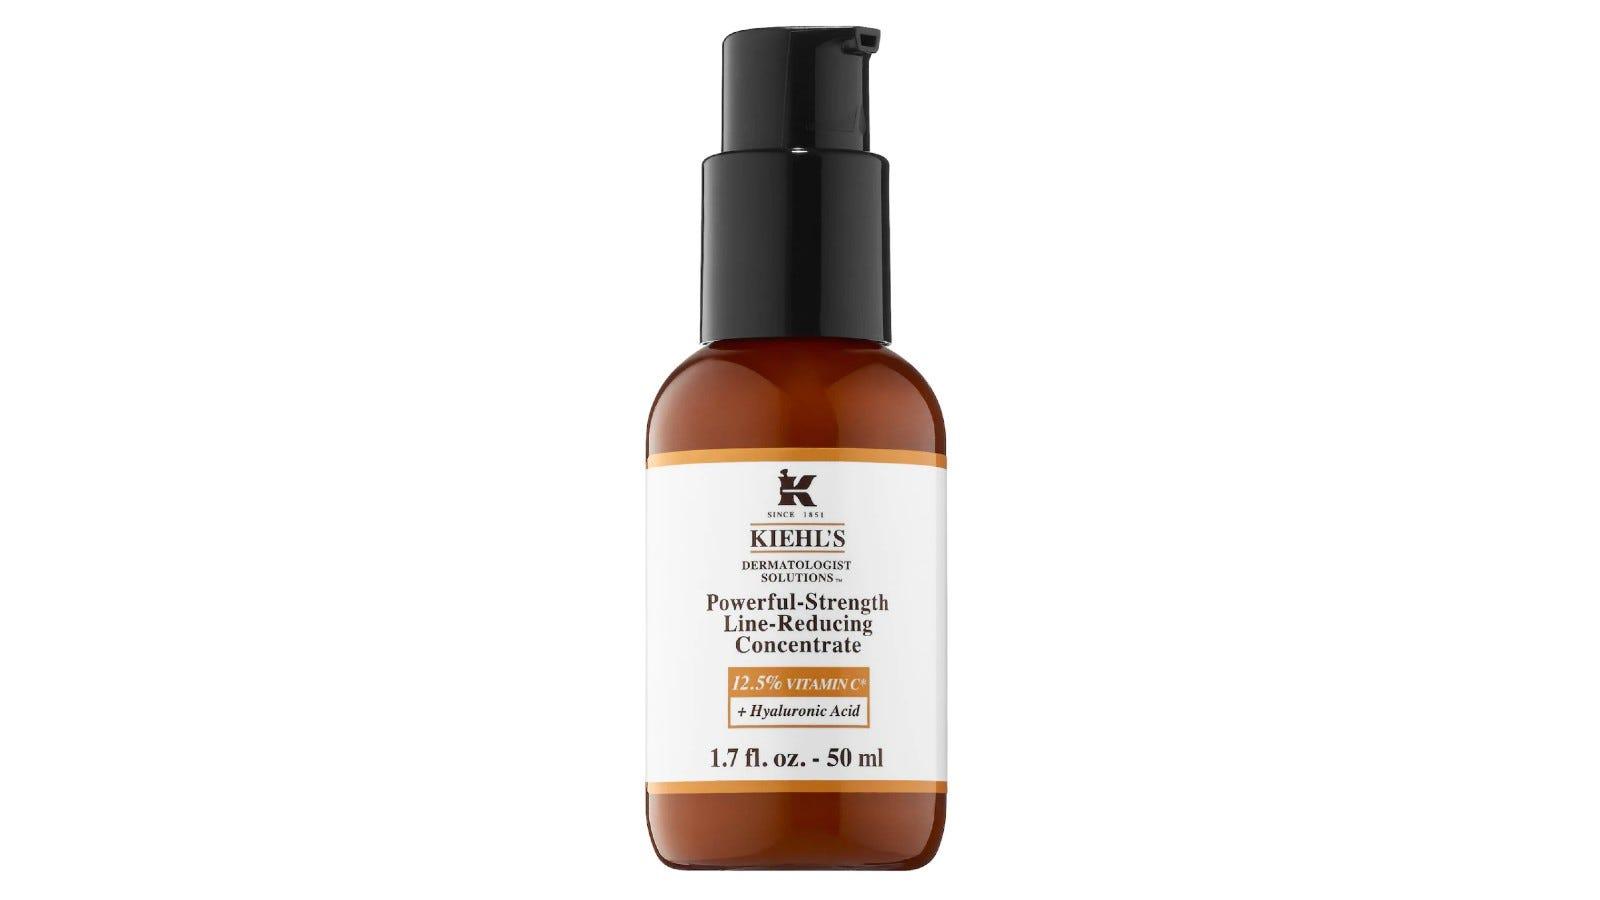 glass bottle of Kiehl's serum